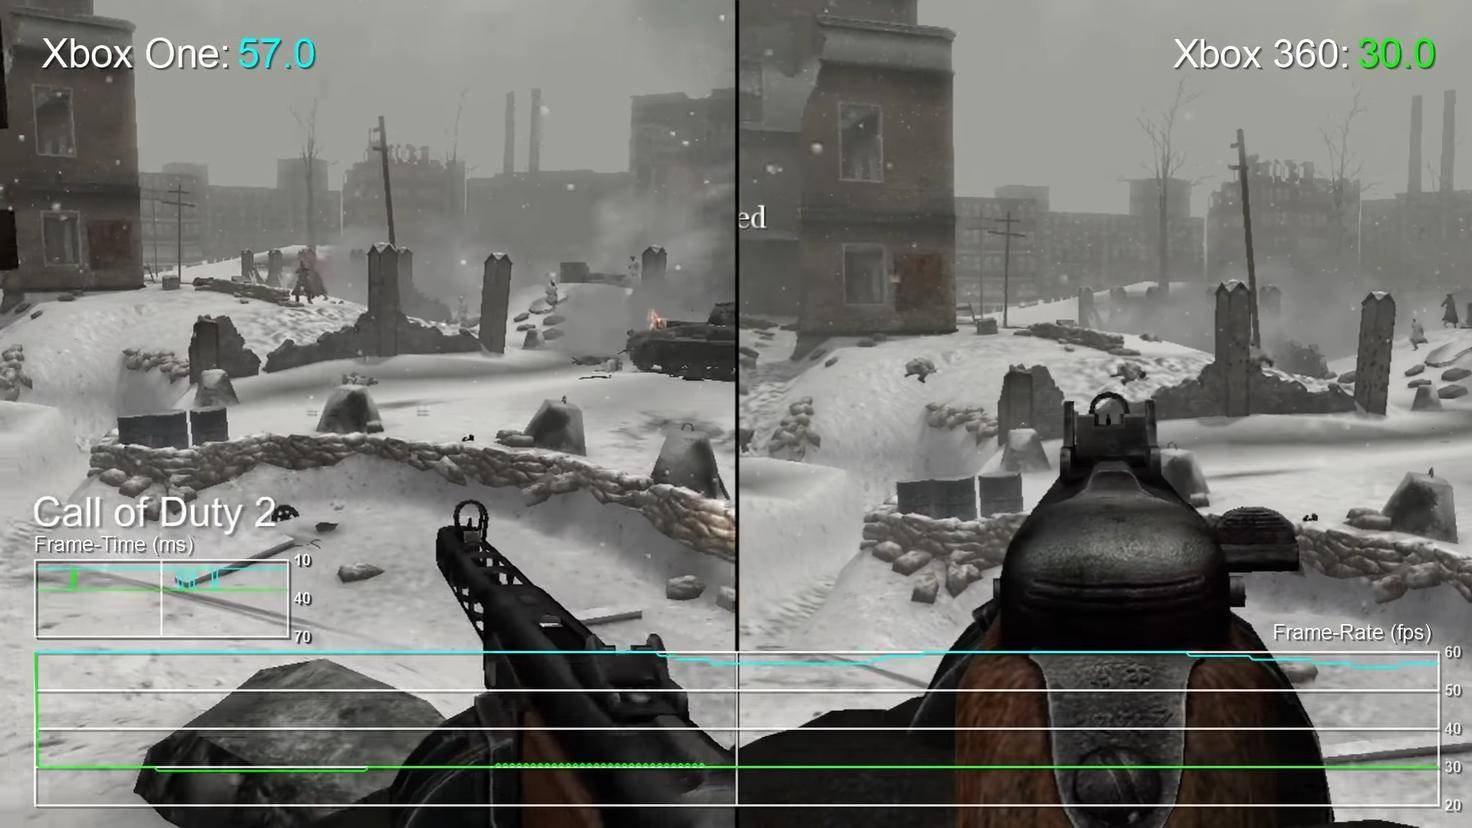 Xbox Scorpio Call of Duty 2